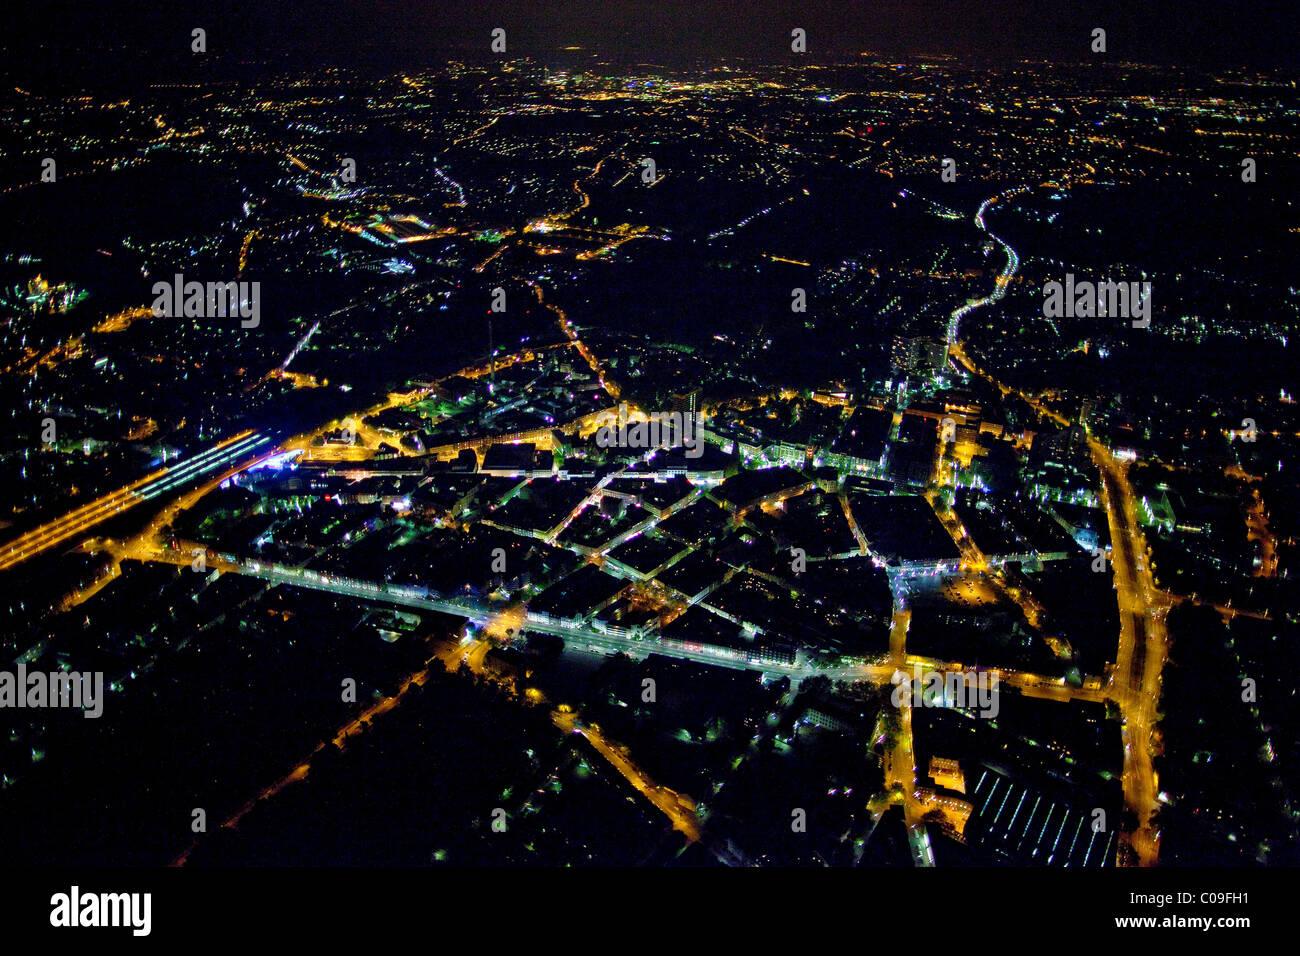 Aerial view, night shot, Gelsenkirchen, Ruhrgebiet region, North Rhine-Westphalia, Germany, Europe - Stock Image